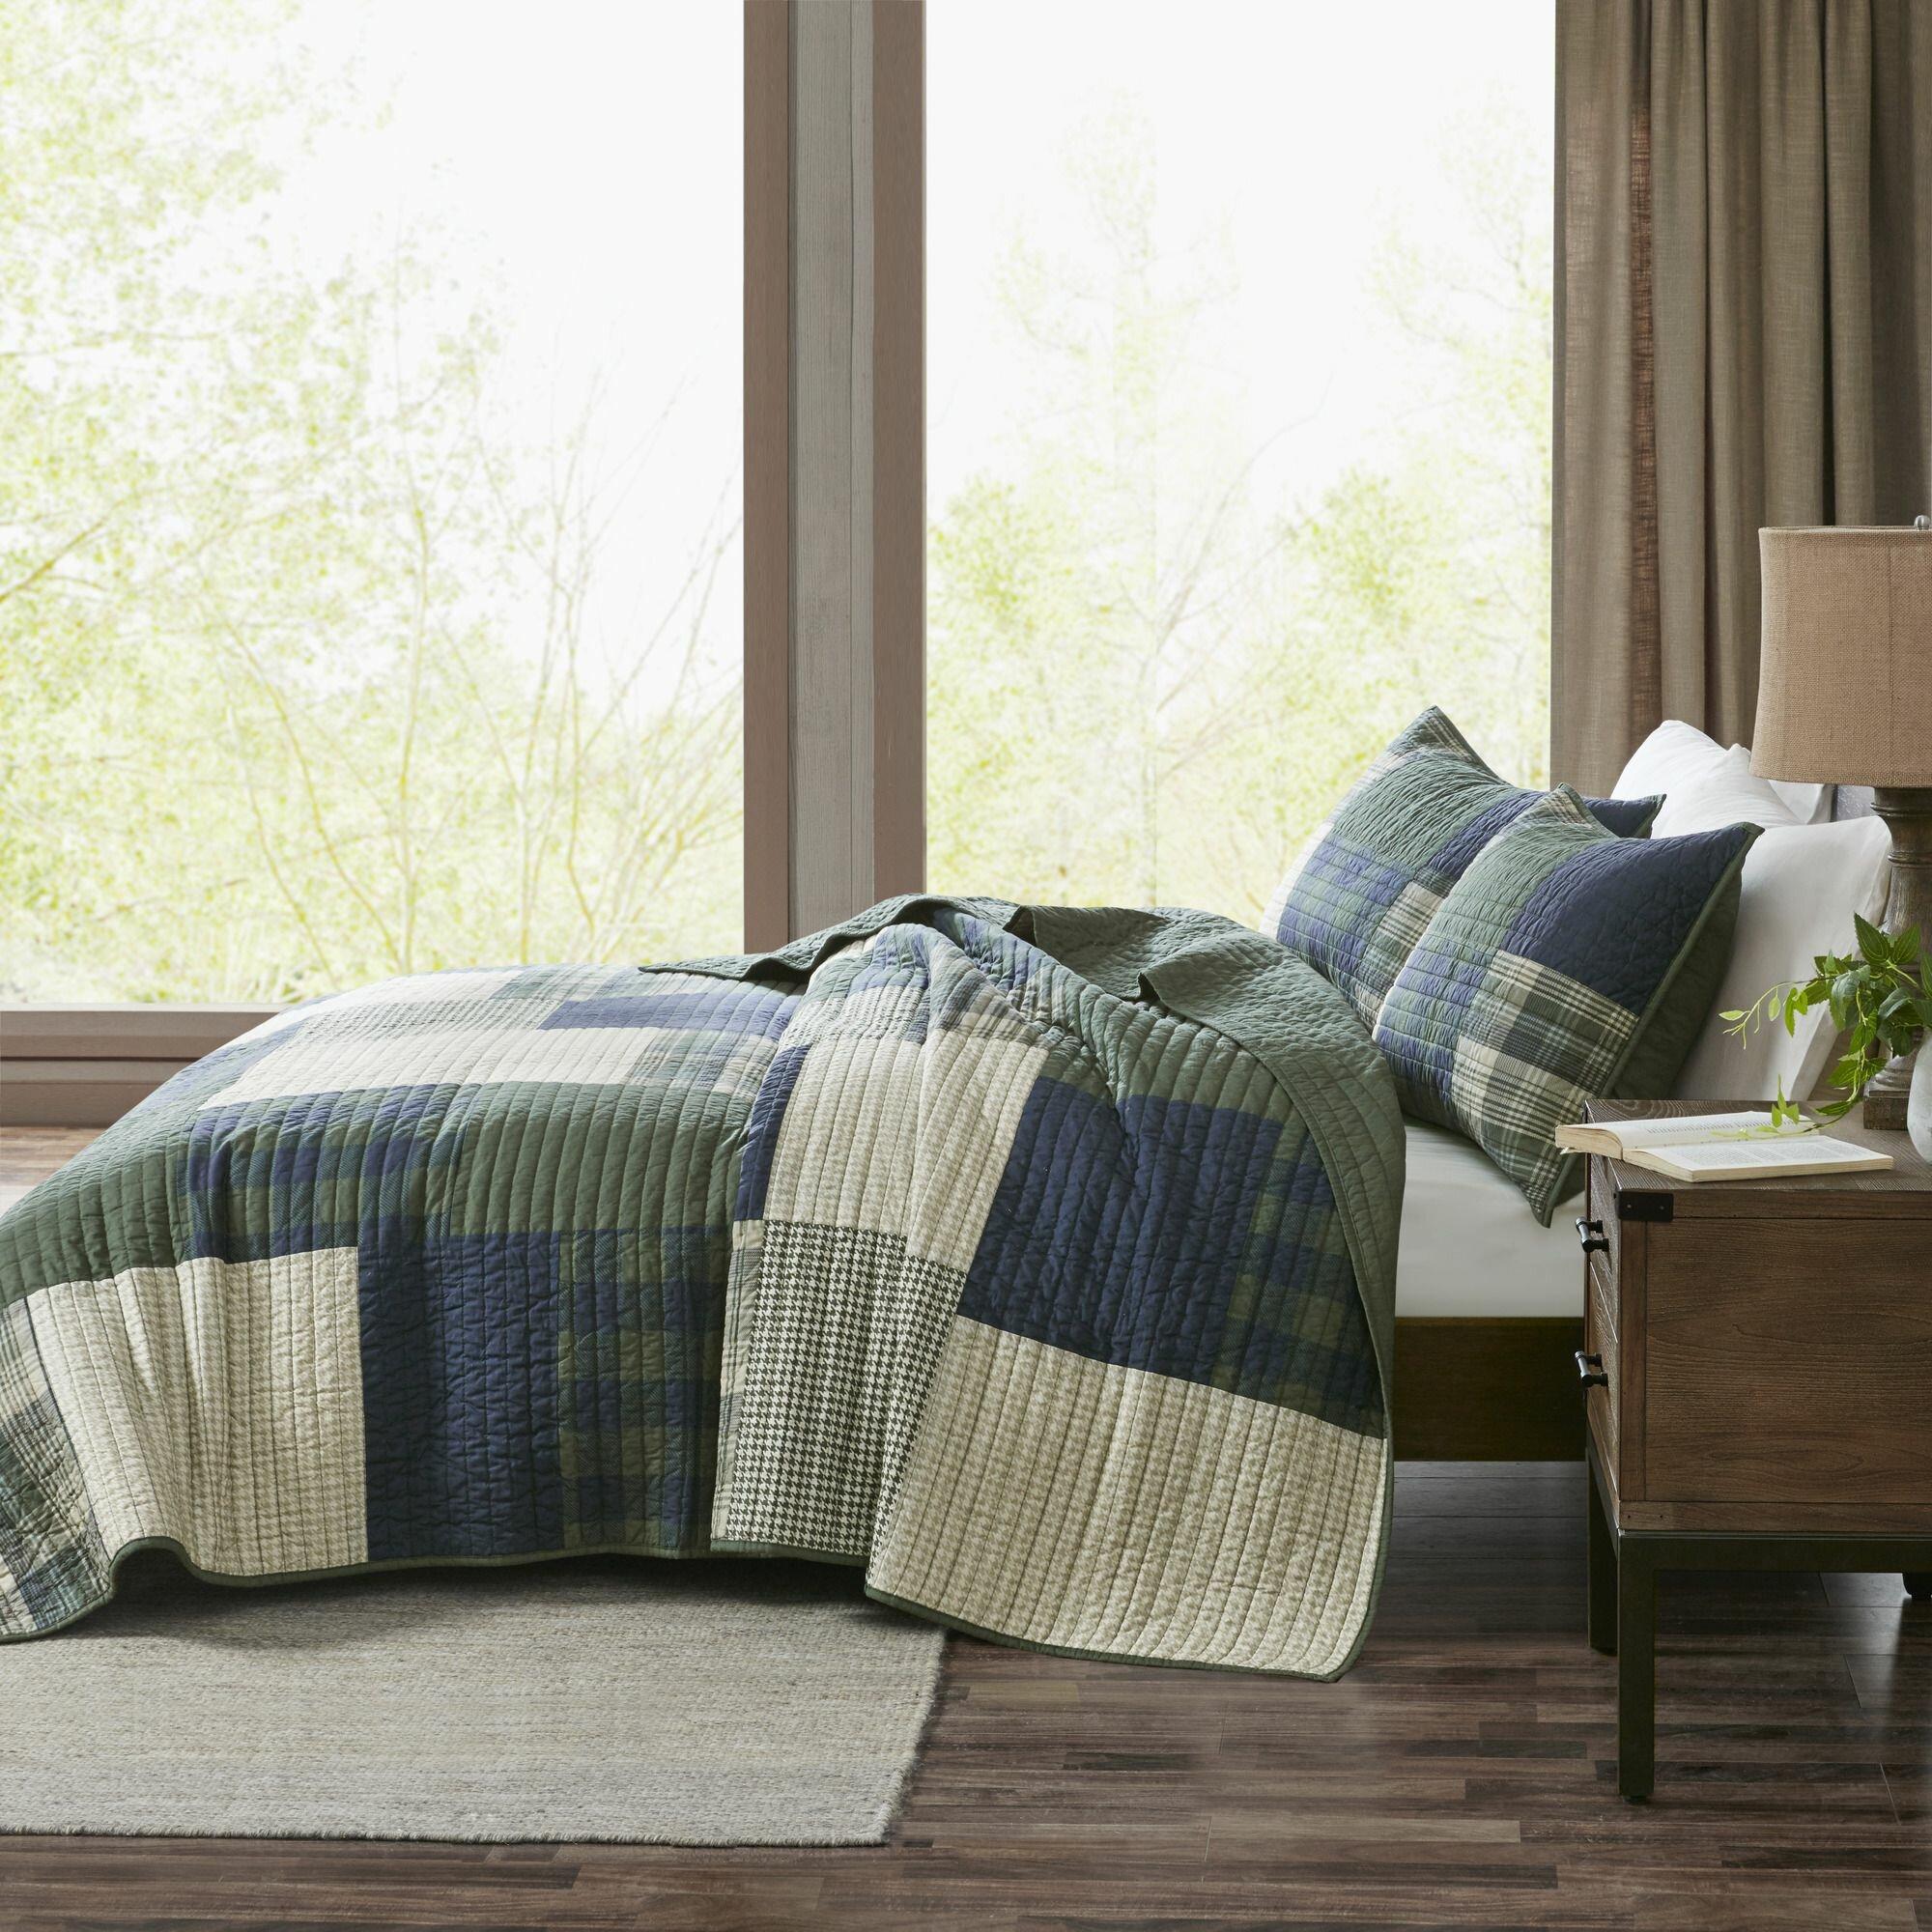 Beach Cottage Blues Greens Patchwork Quilt Sham Window Valance Pillow